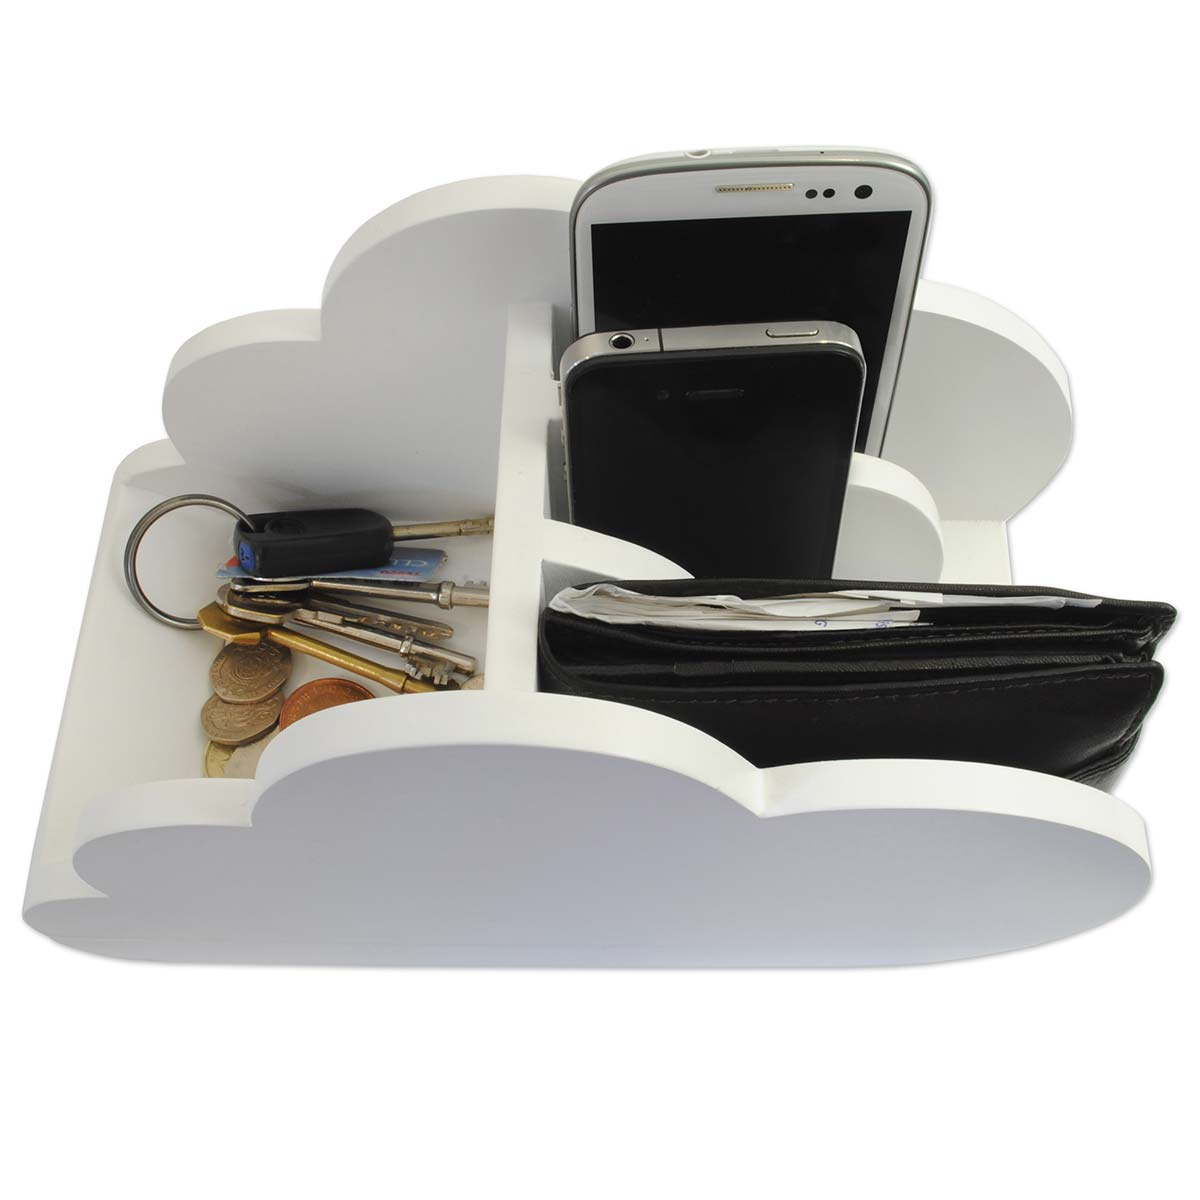 Cloud Aufbewahrung